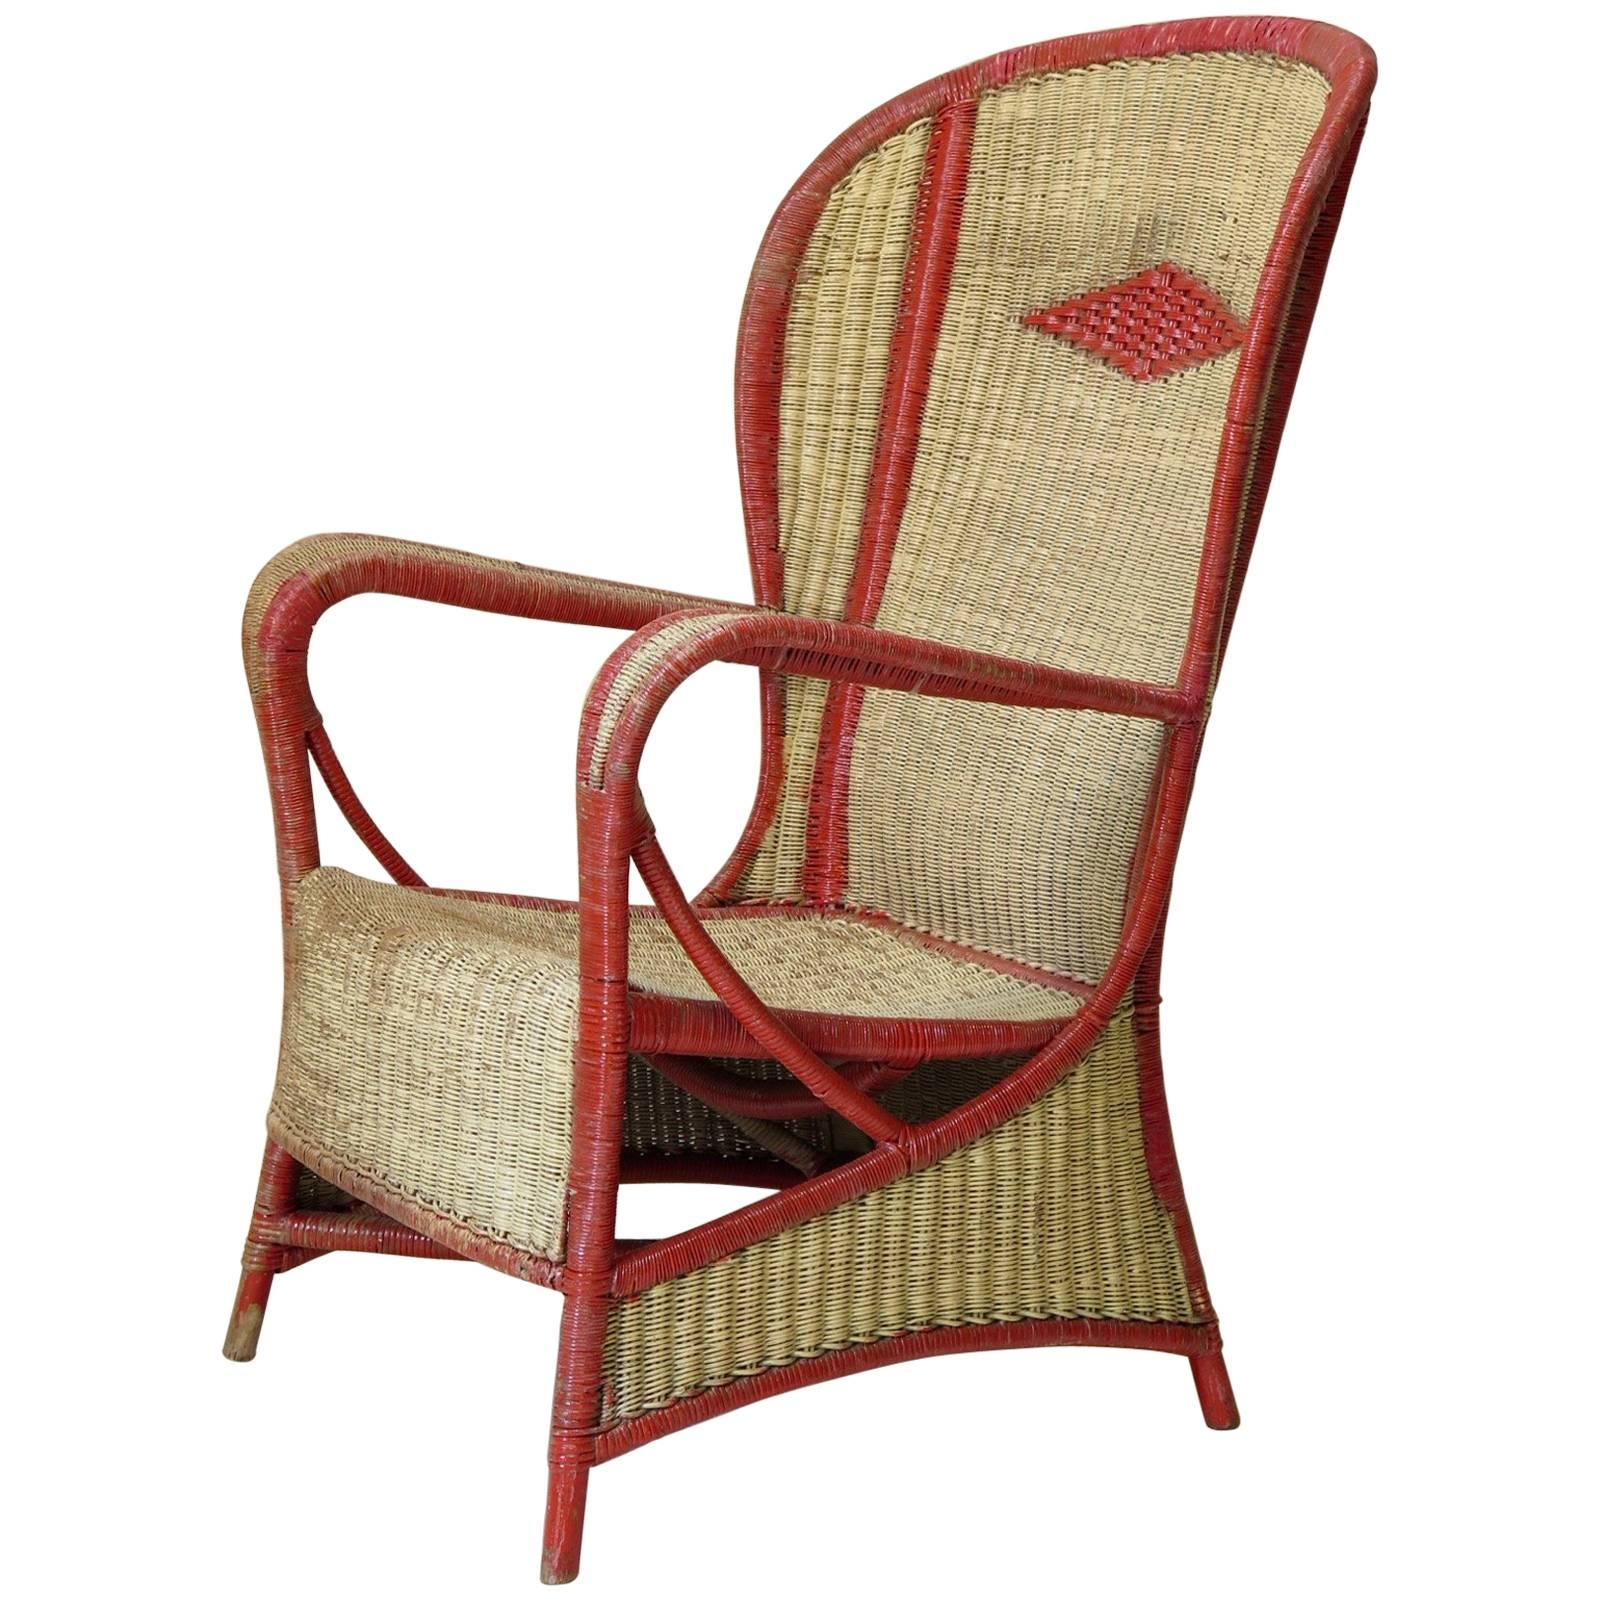 Large Painted Wickerwork Wingback Armchair, circa 1920s